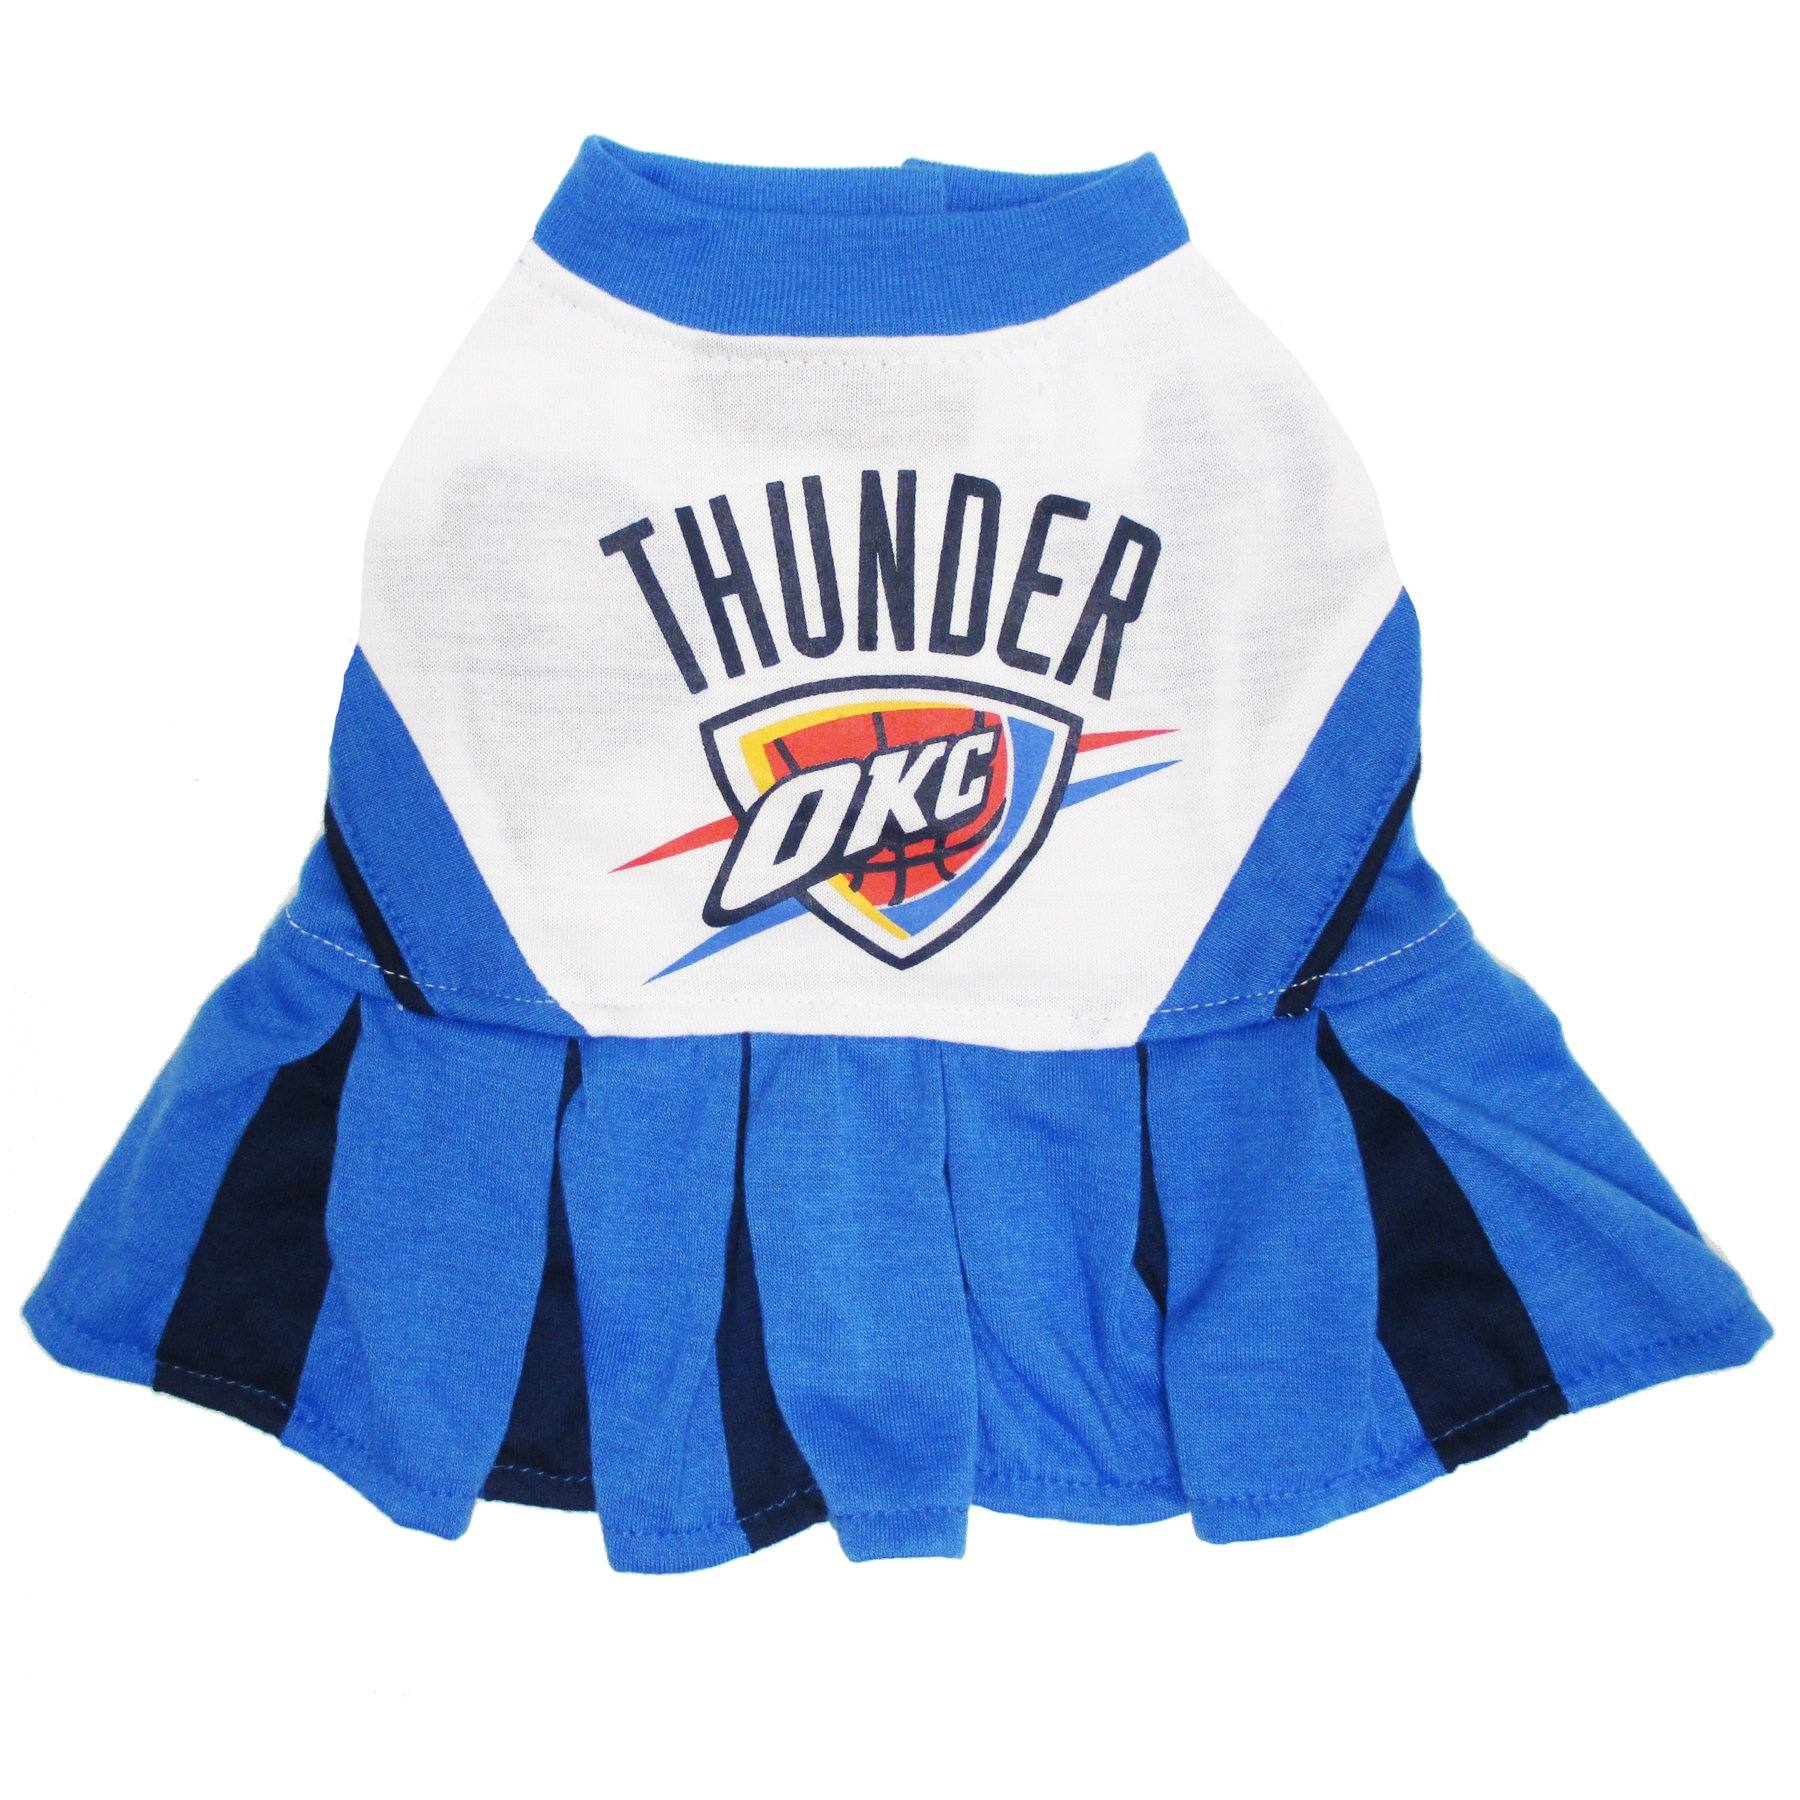 Pets First NBA Oklahoma City Thunder Dog Cheerleader Dress, Medium by Pets First (Image #1)